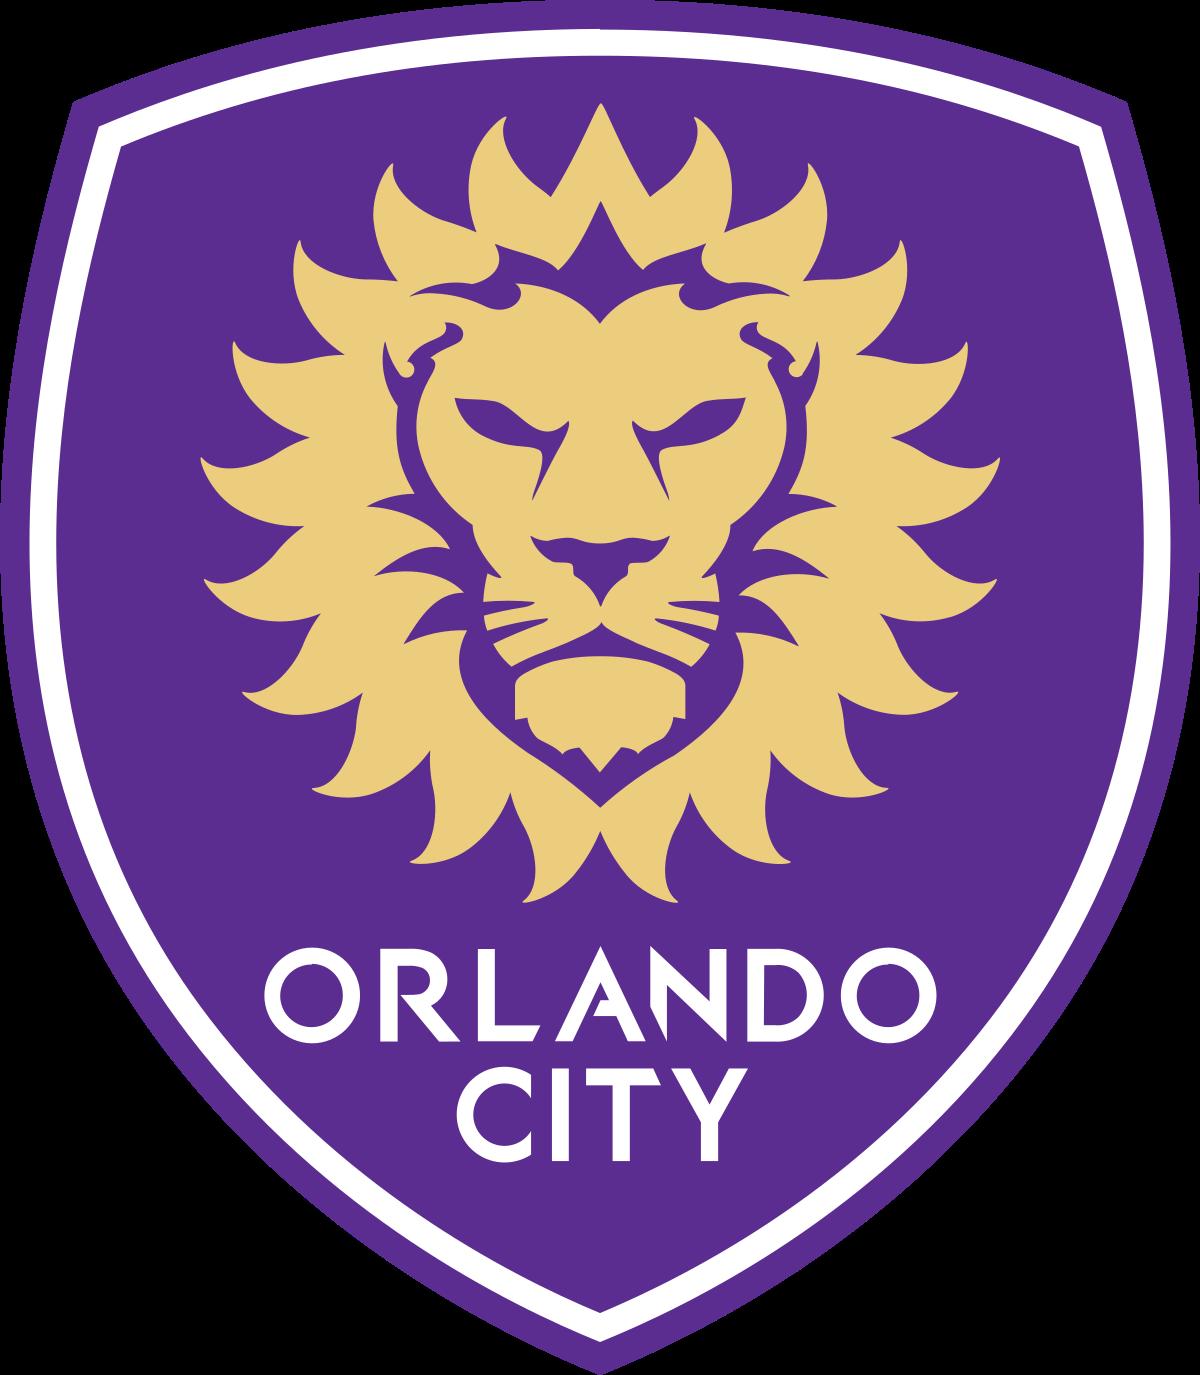 Orlando City Tickets